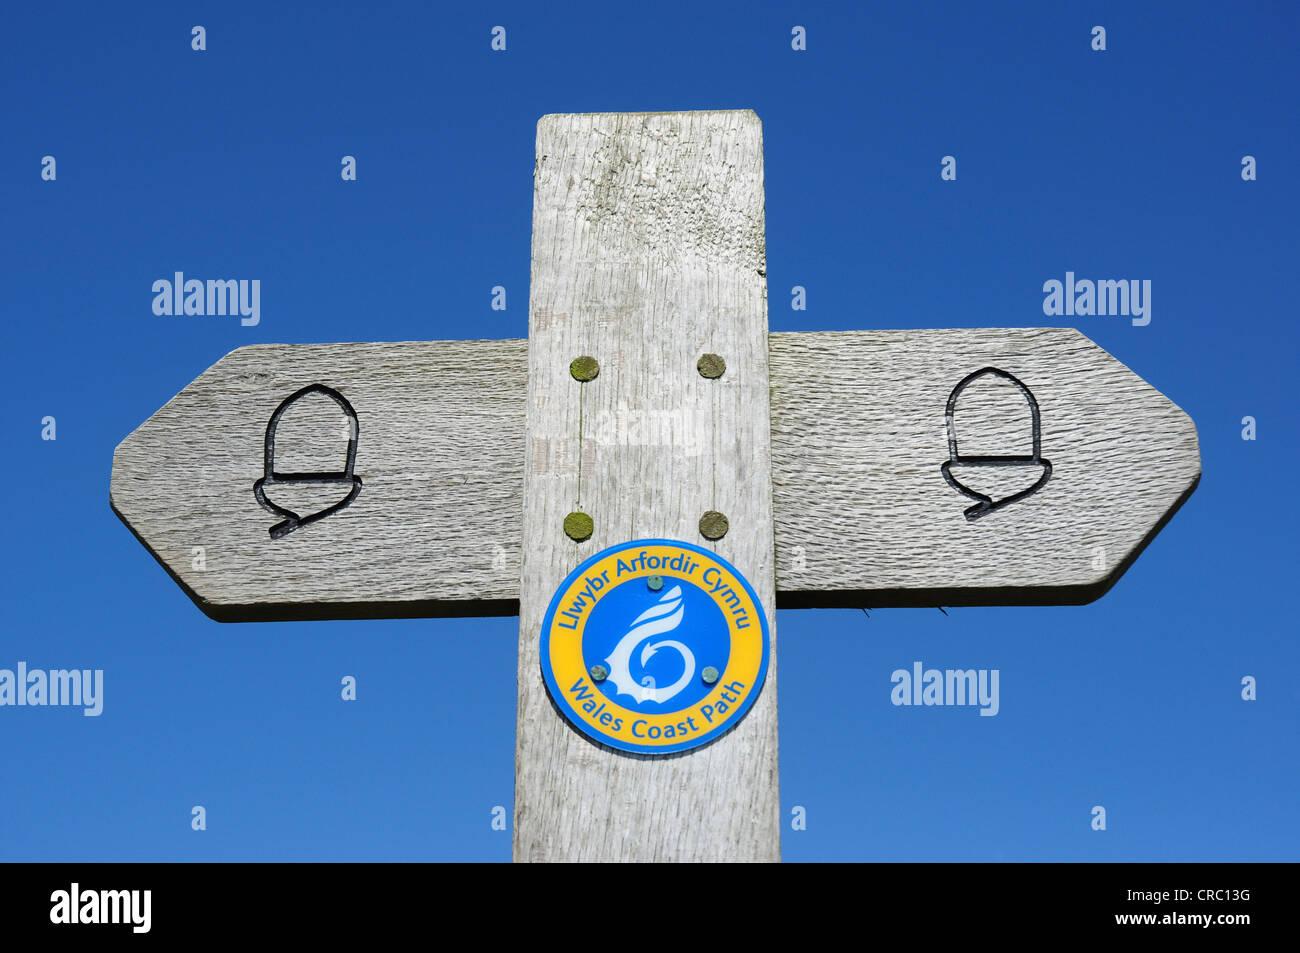 Wales Coast Path sign, Pembrokeshire, Wales, UK - Stock Image